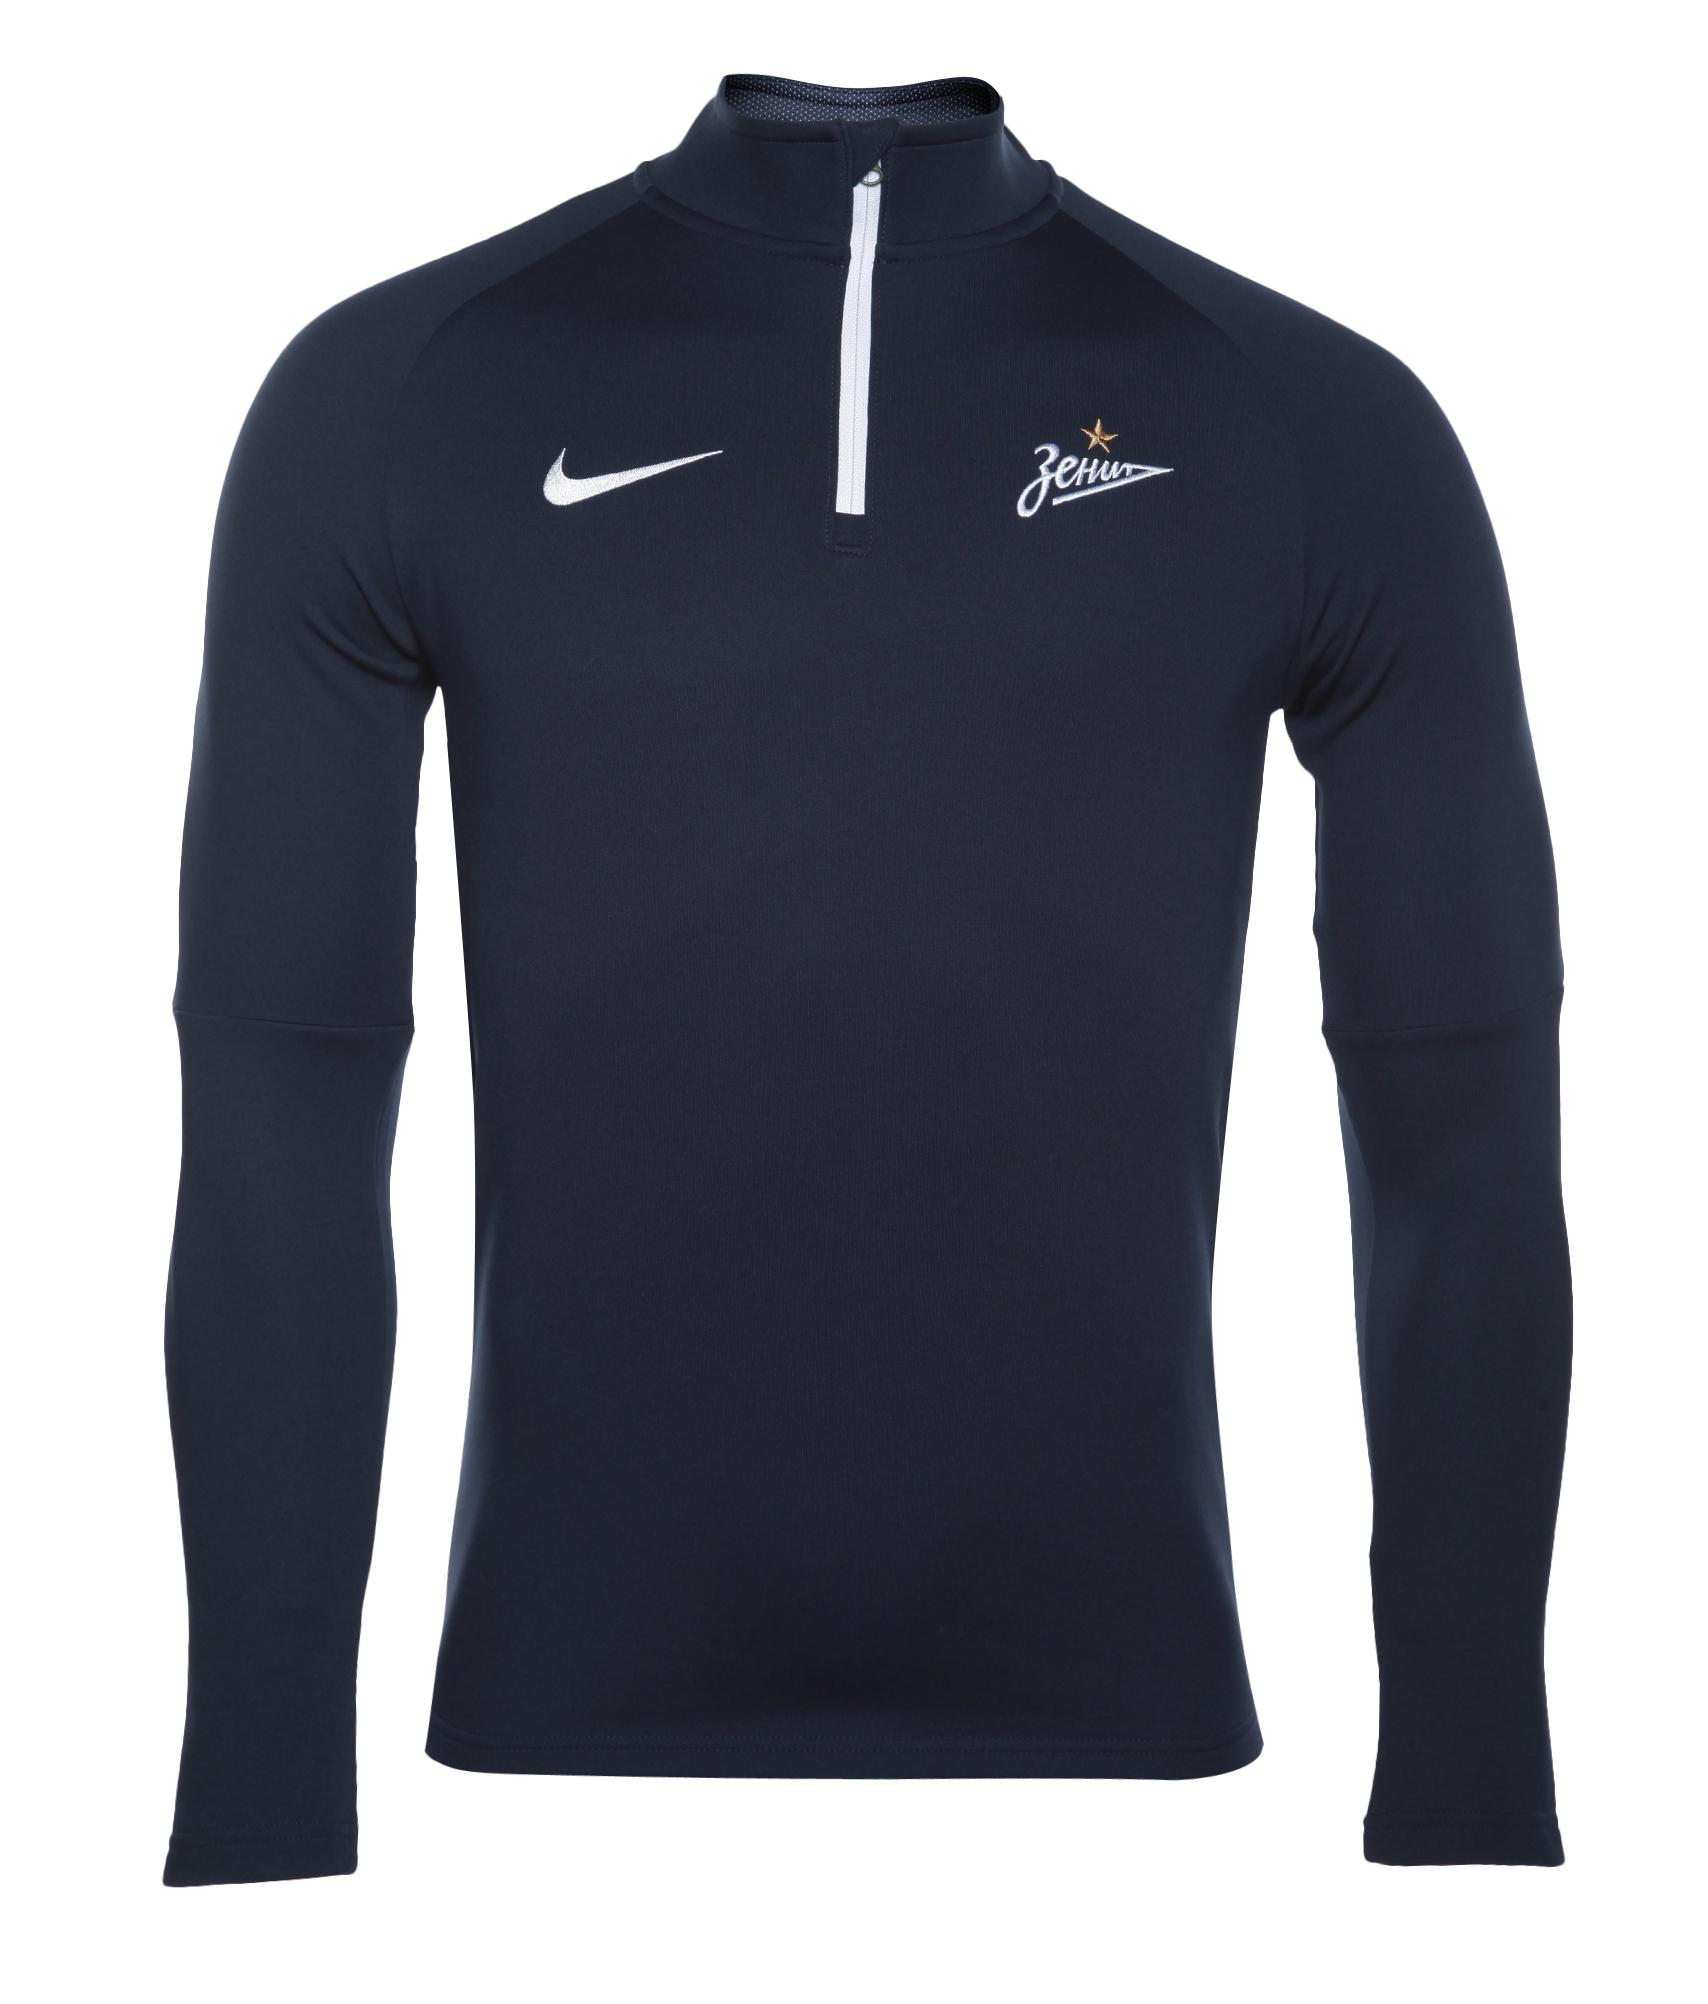 Джемпер тренировочный Nike Nike Цвет-Темно-Синий джемпер тренировочный подростковый nike цвет темно синий размер m